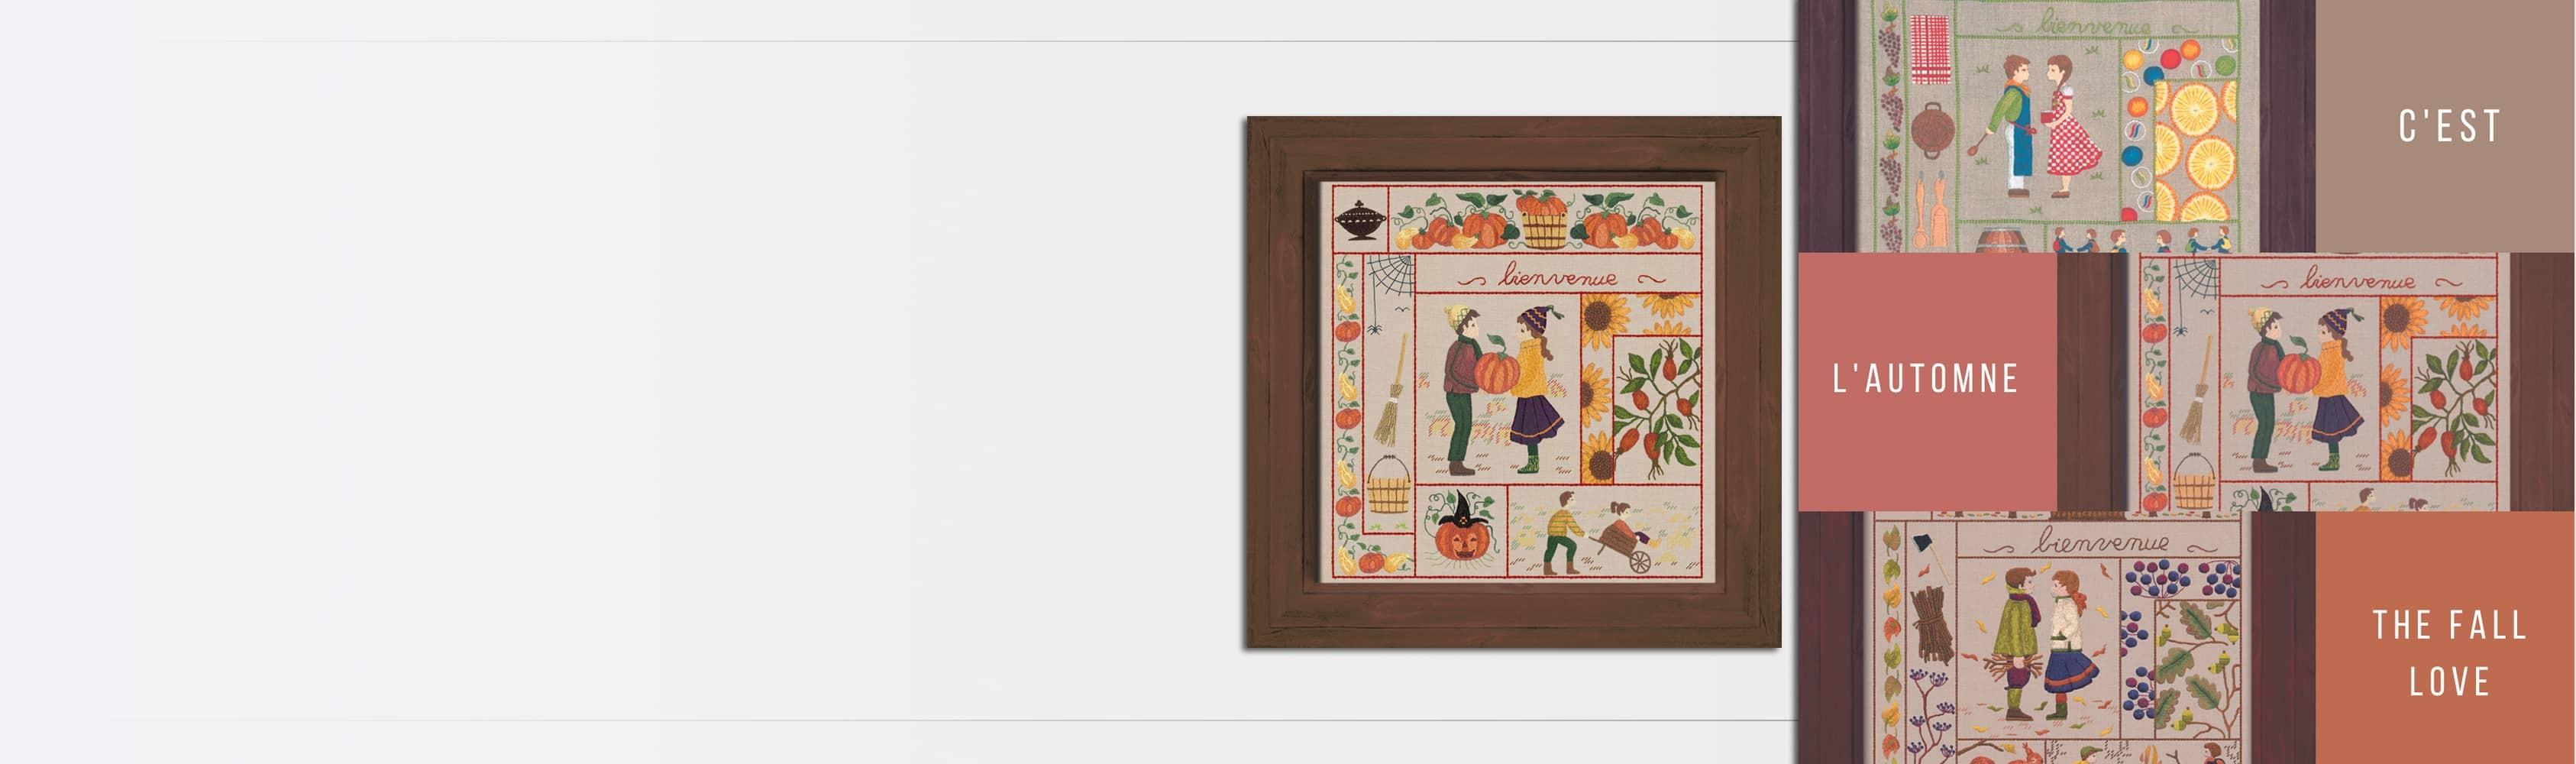 Welcome Kits - September, October, November. Traditional embroidery, printed design. Le Bonheur des Dames series 77